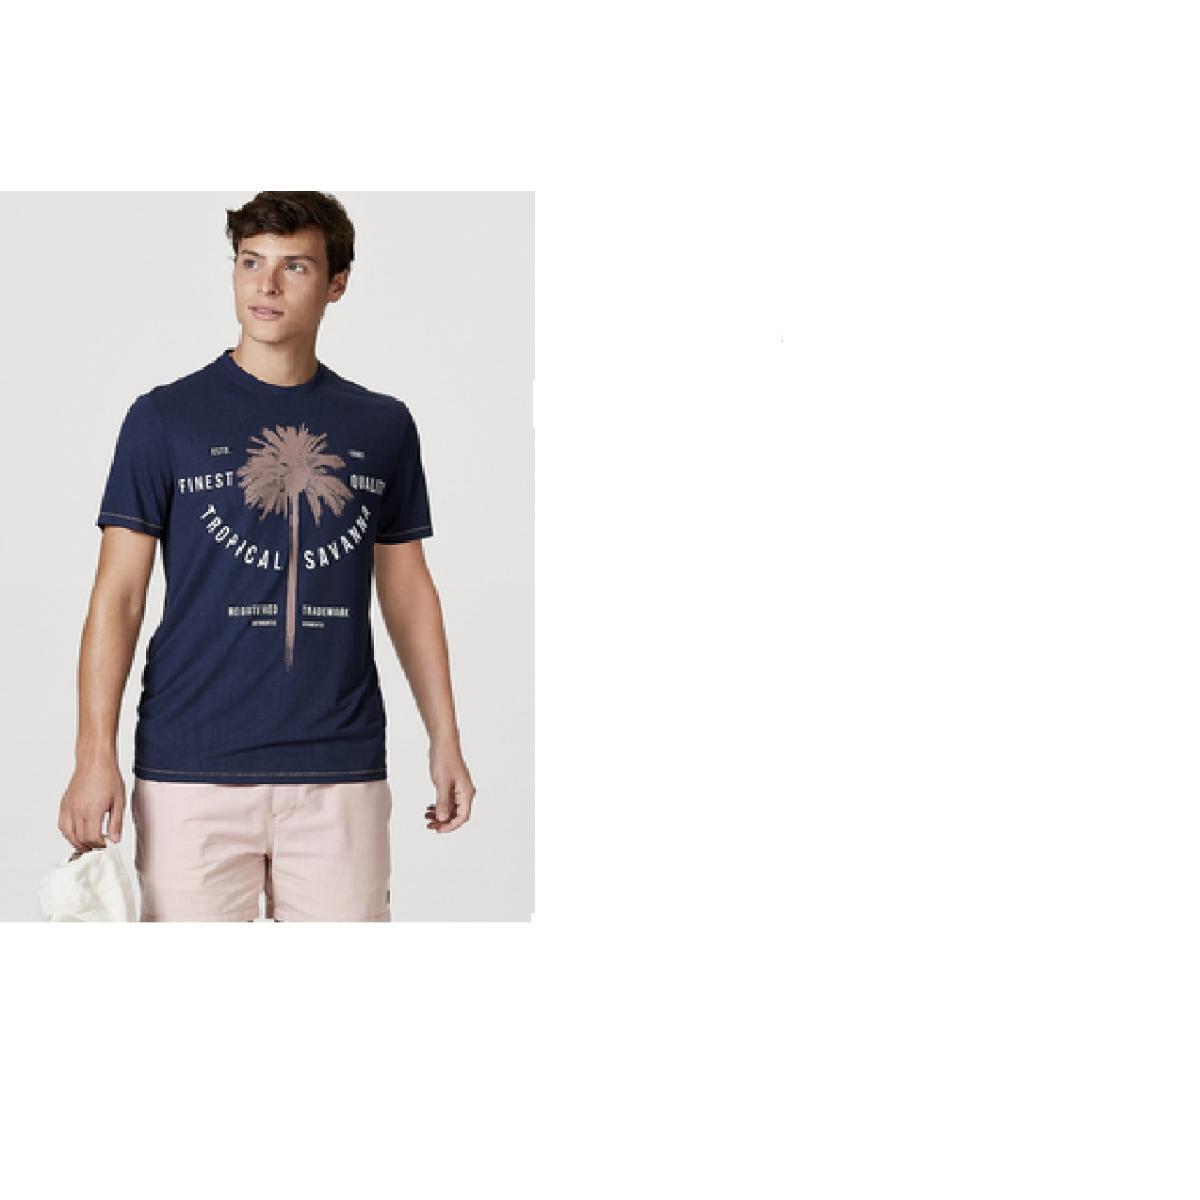 Camiseta Masculina Hering 4ekb Axten Marinho